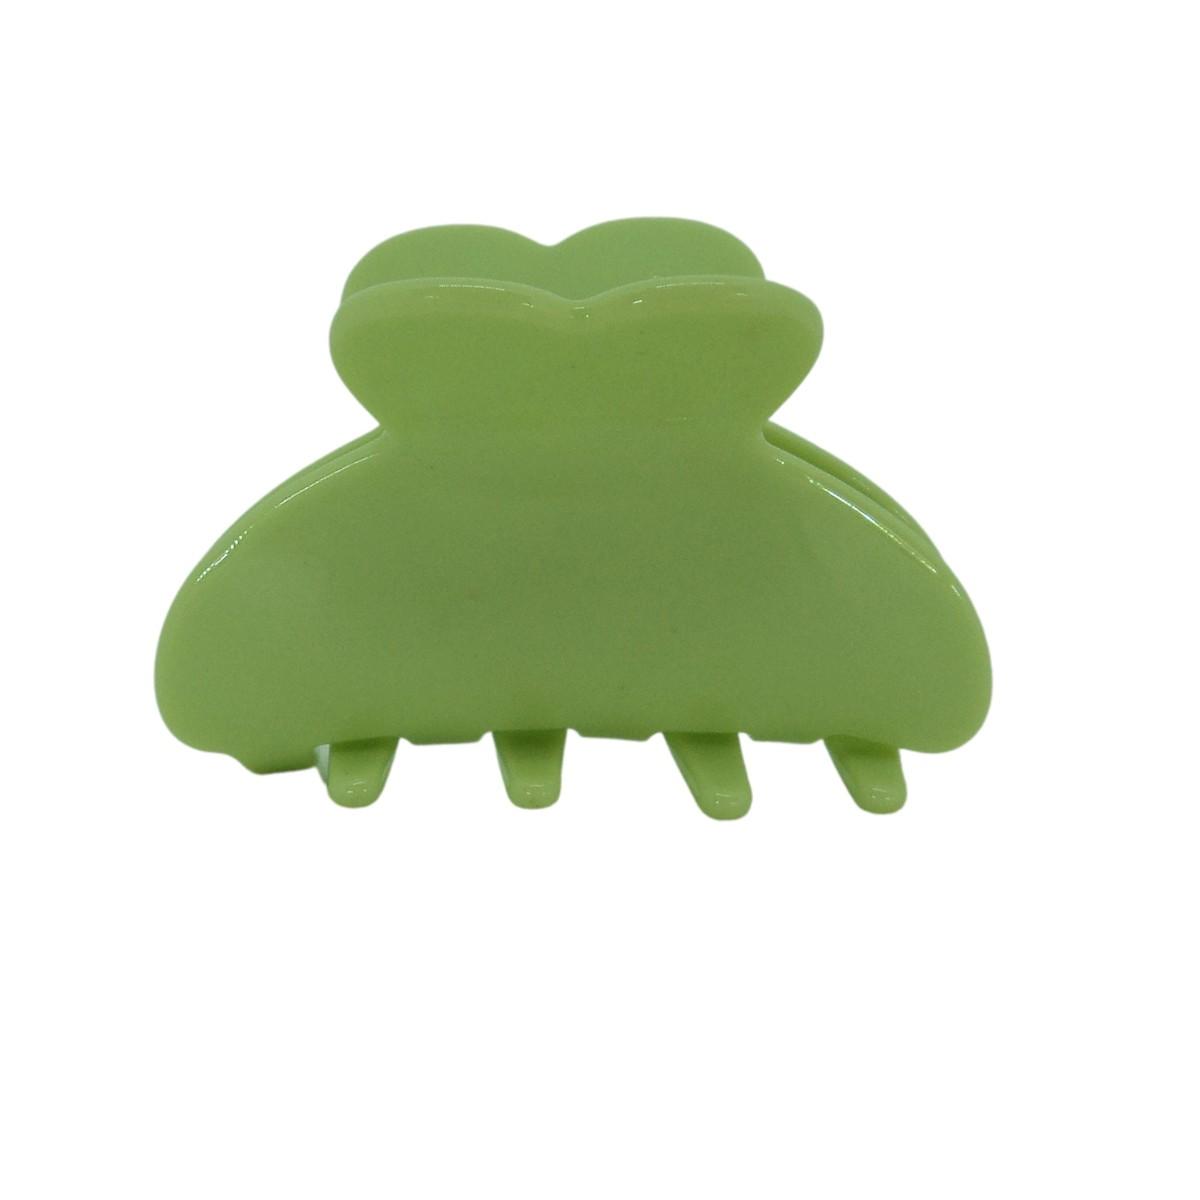 Piranha Pastel